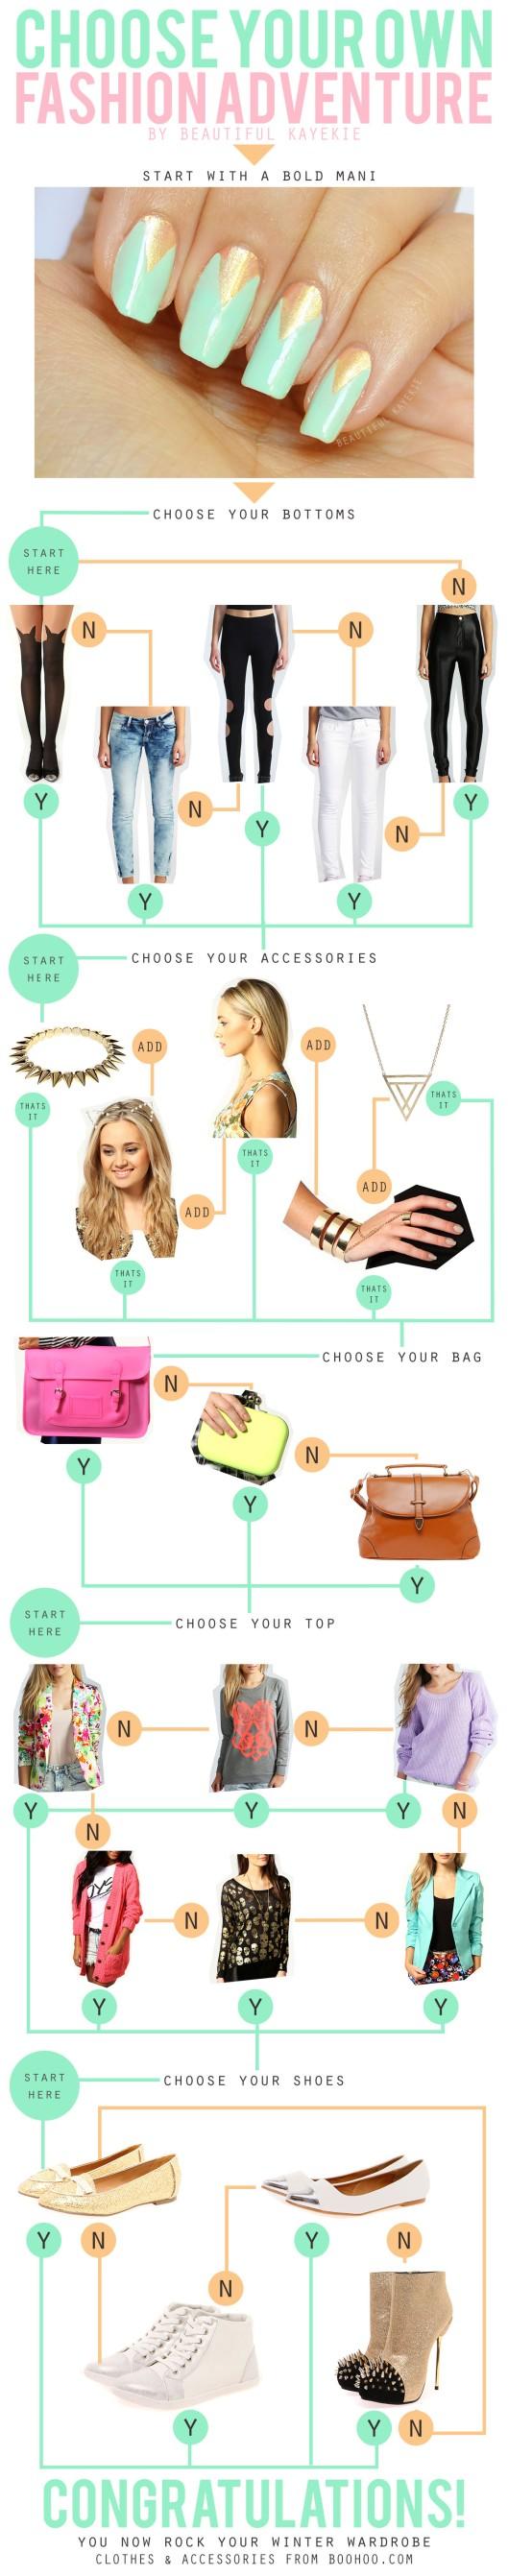 choose your own fashion adventure boohoo.com collaboration